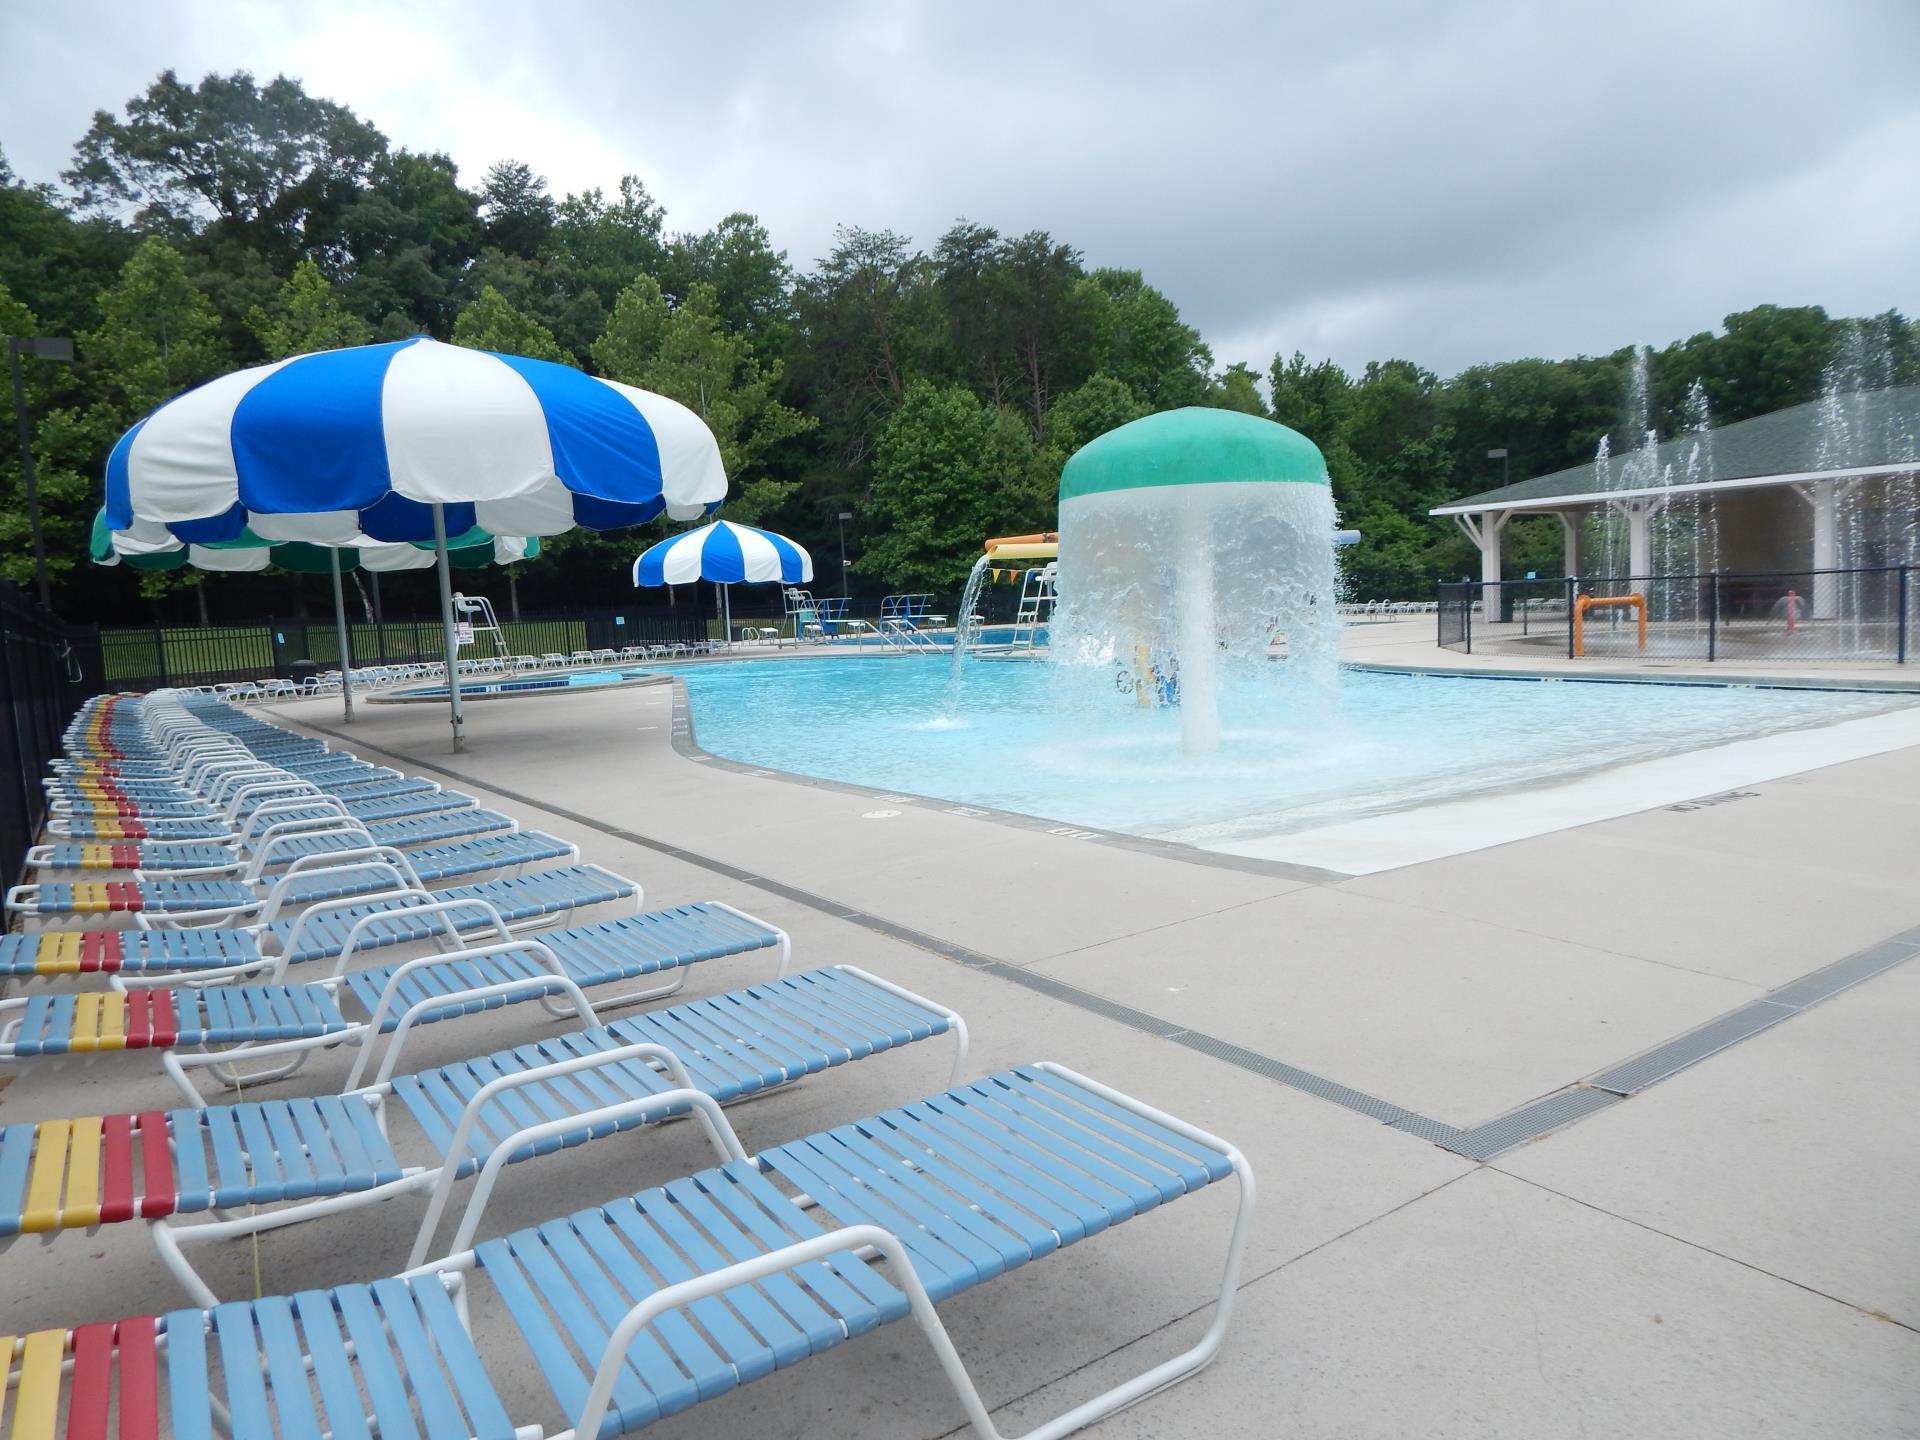 Bur-Mil Park Aquatic Center (Guilford County)